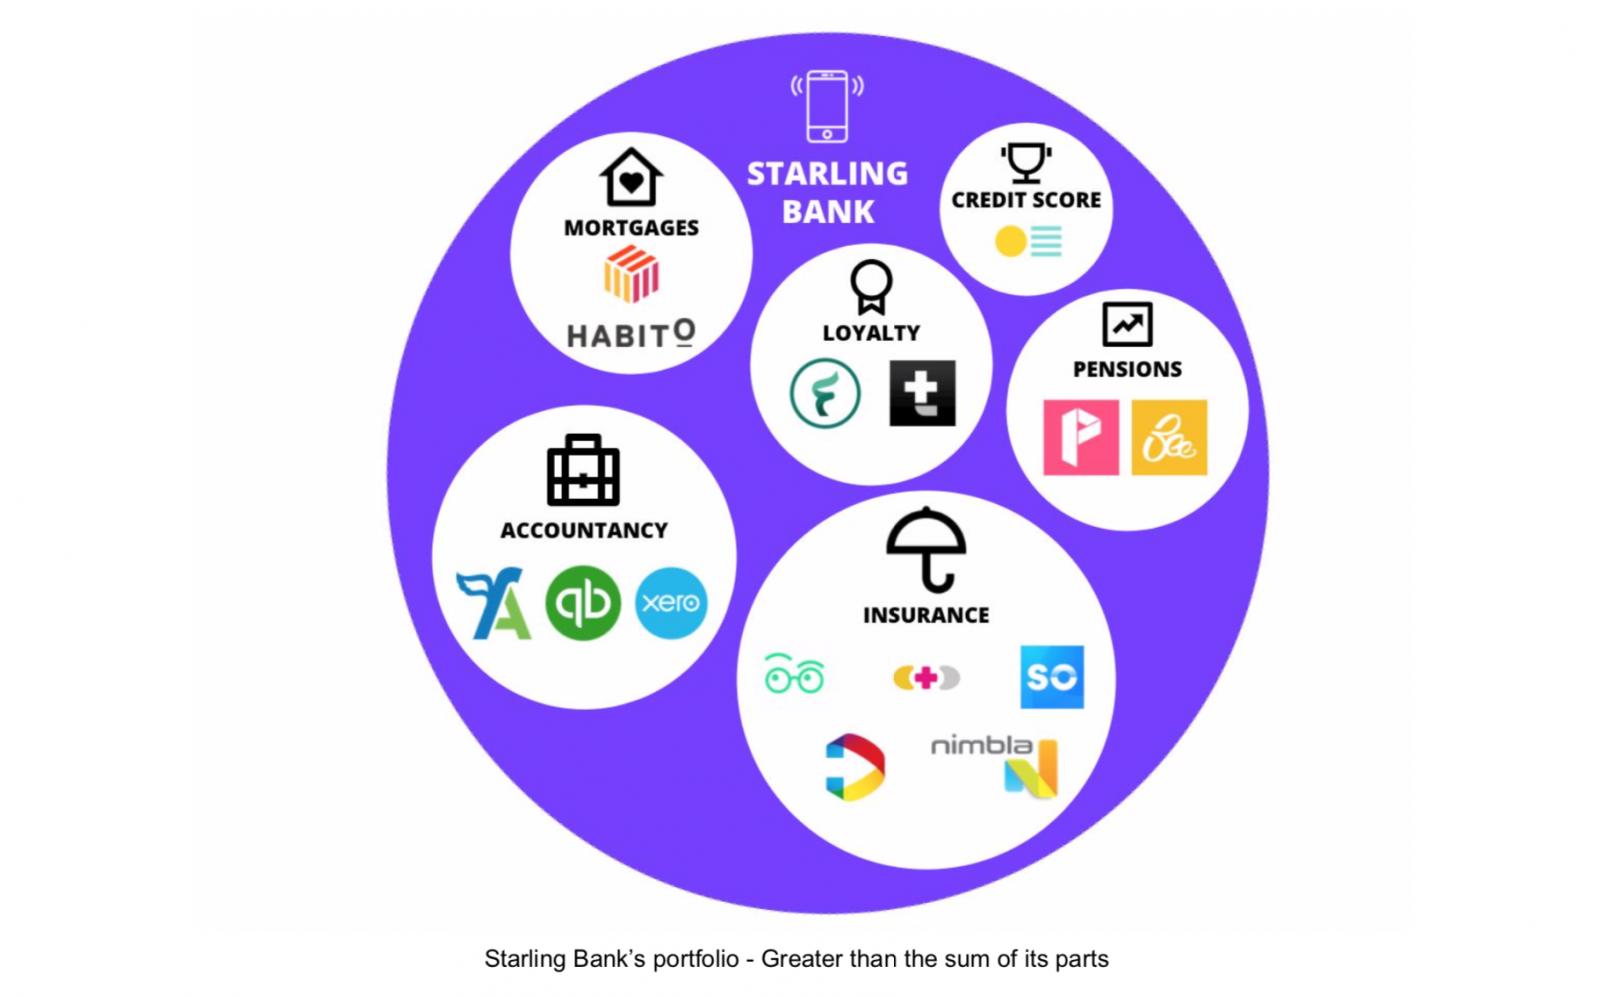 Starling Bank's portfolio